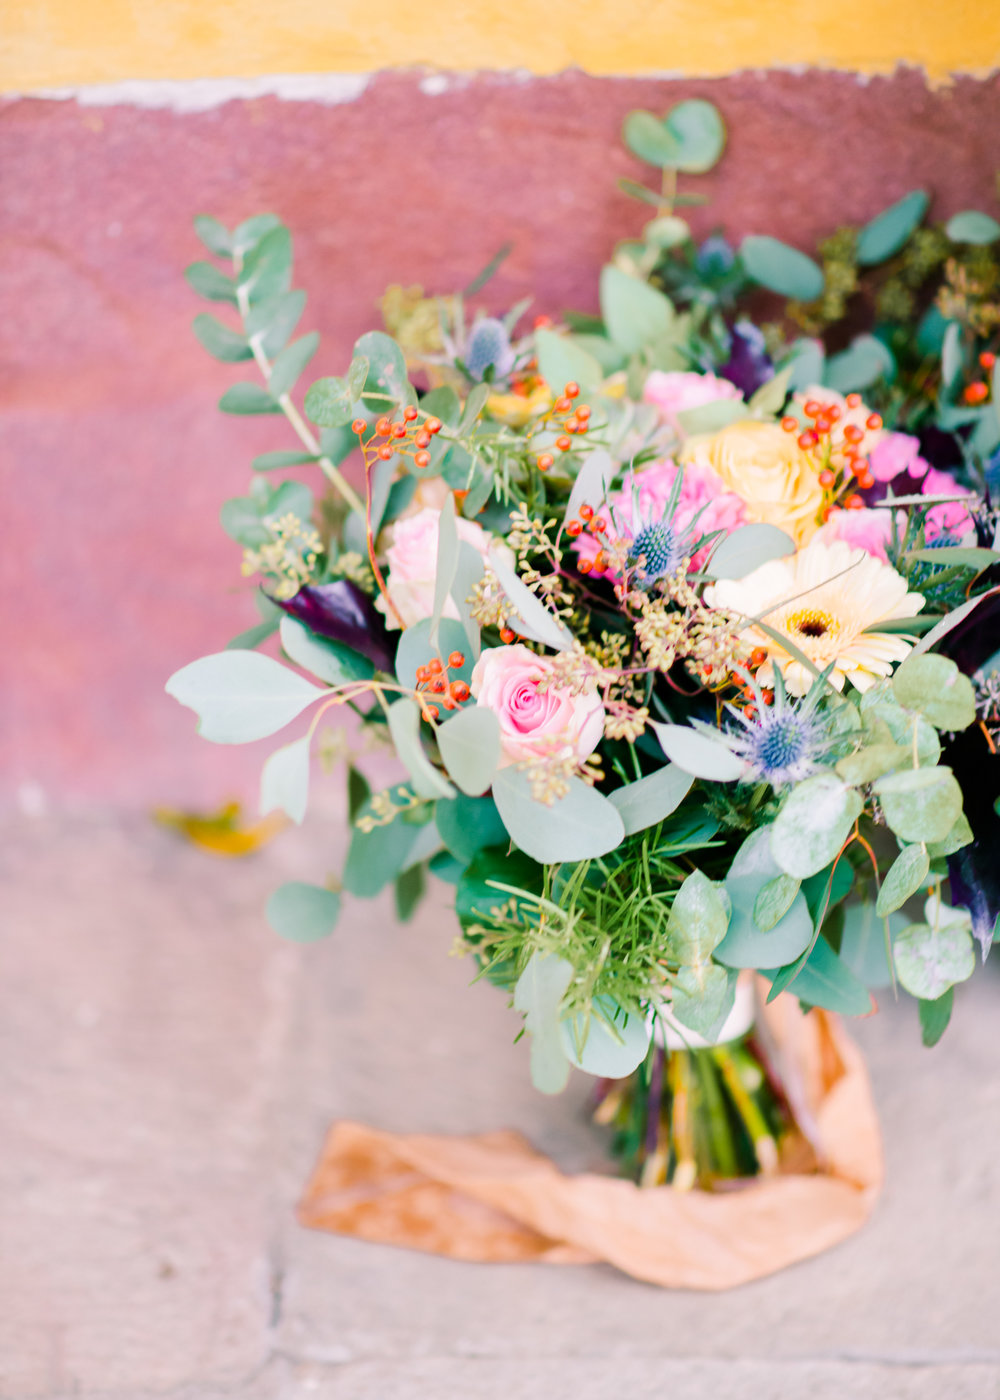 Elegant Organic Fall Swedish Bridal Wedding Styled Shoot - Erika Alvarenga Photography-109.jpg